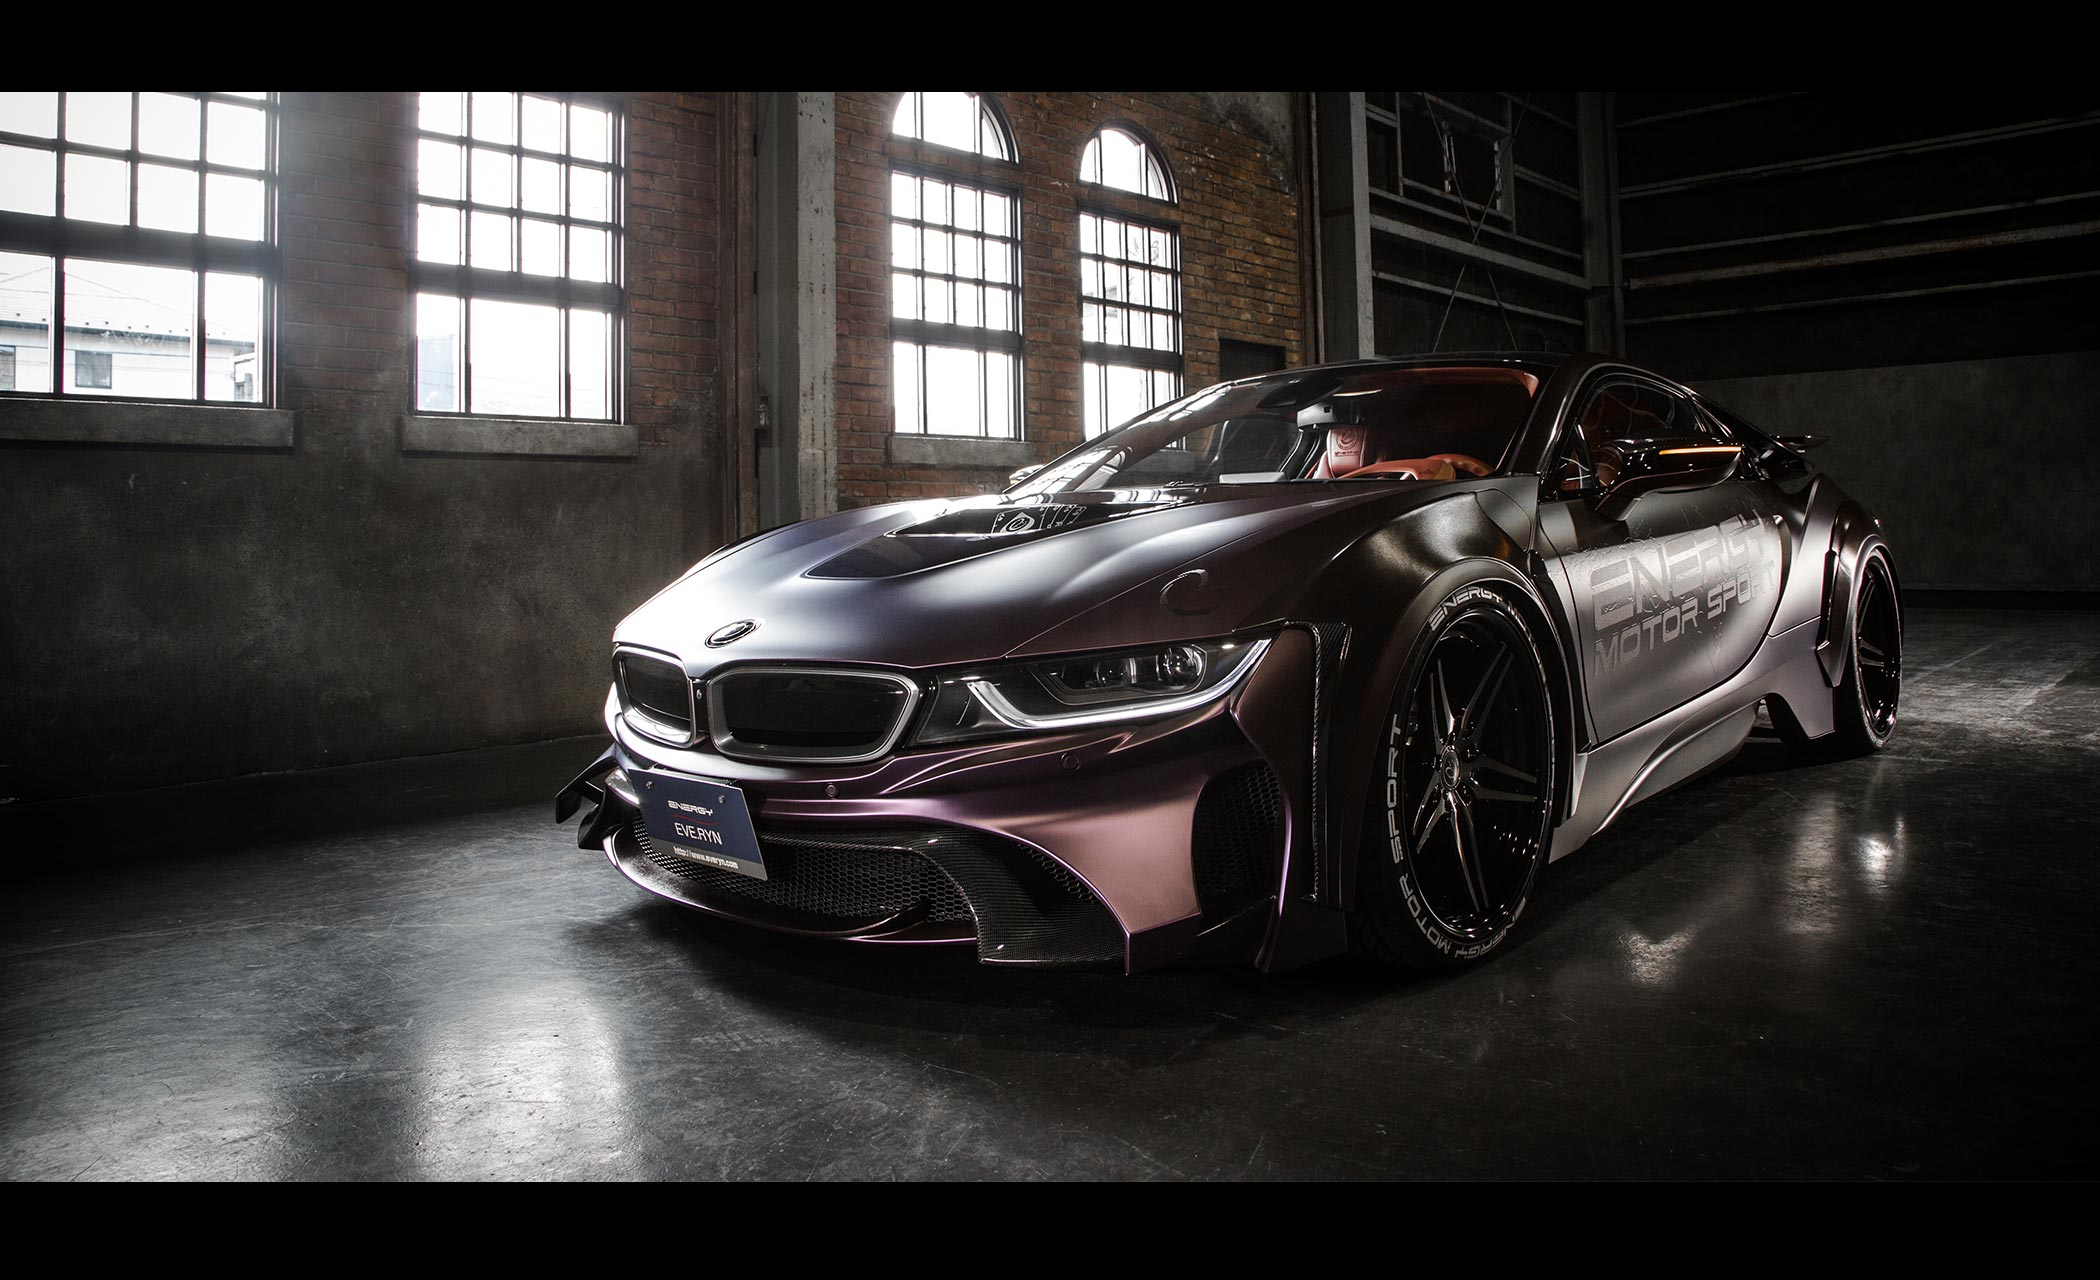 Energy Motorsport - BMW i8 Dark Knight Edition - 2017 - front